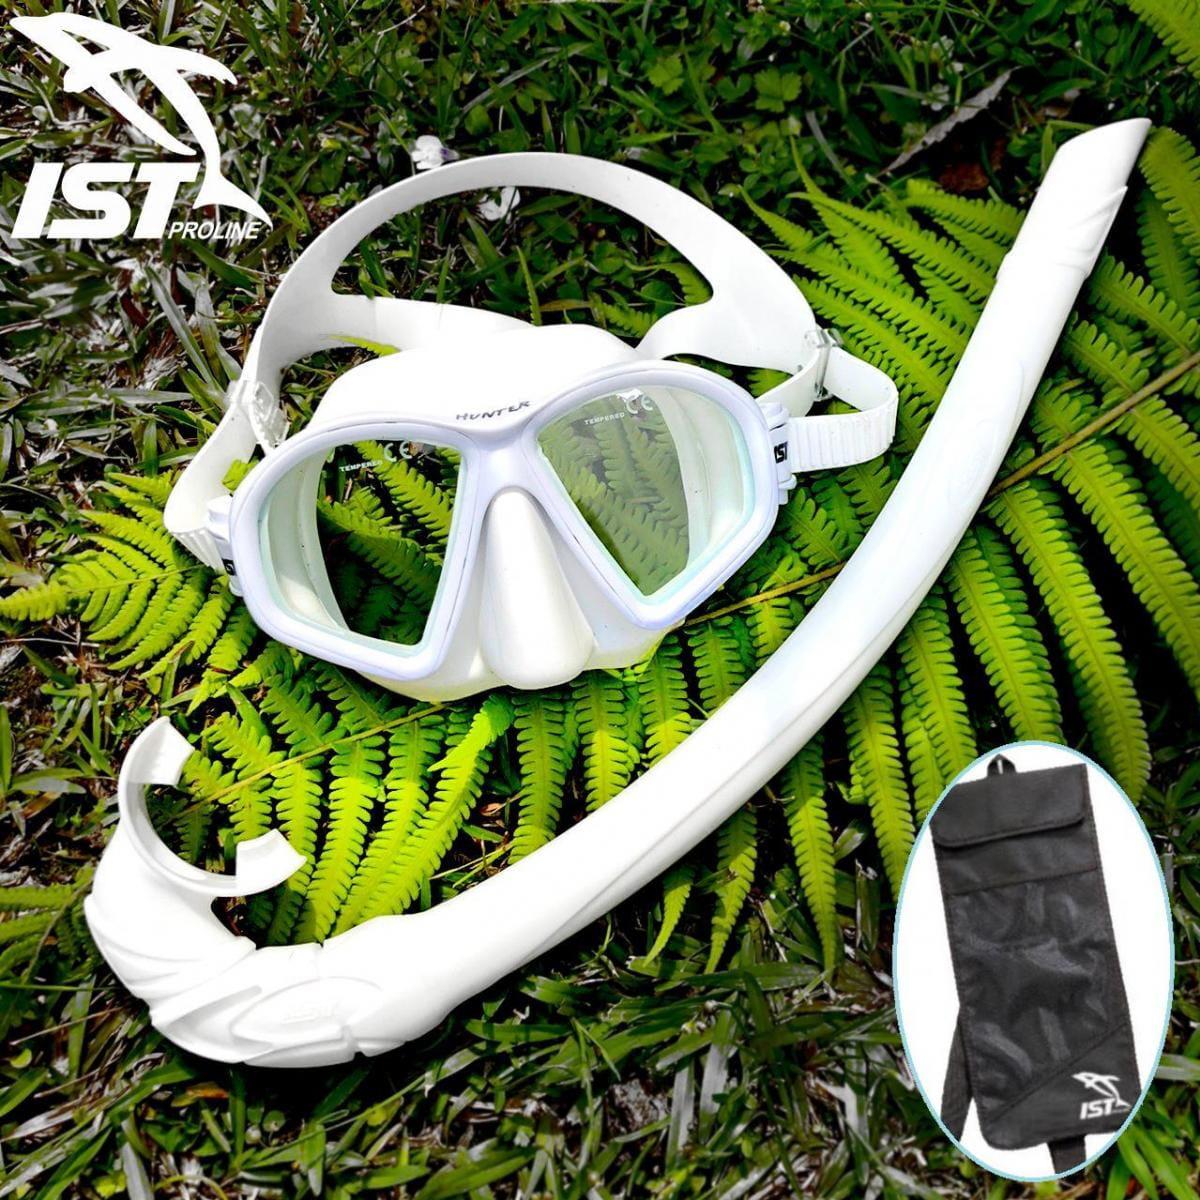 【IST】CS36 - HUNTER自由潛水新手套組 - 加贈環保網袋 0